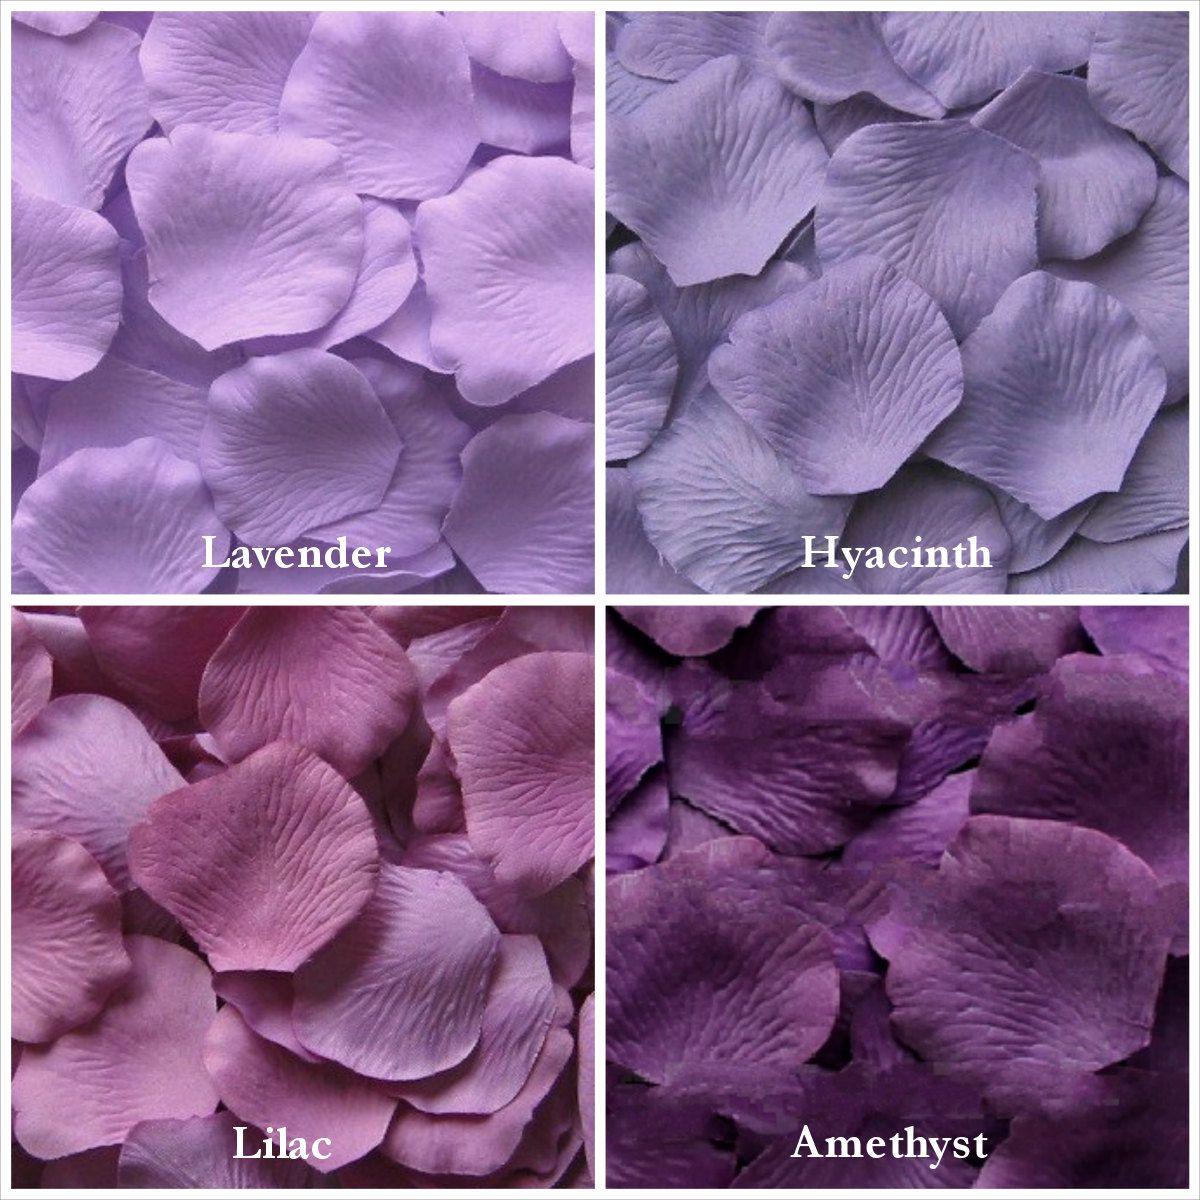 Purple Rose Petals In 14 Shades Purple Silk Rose Petals Fake Etsy In 2020 Fake Rose Petals Flower Girl Petals Purple Roses